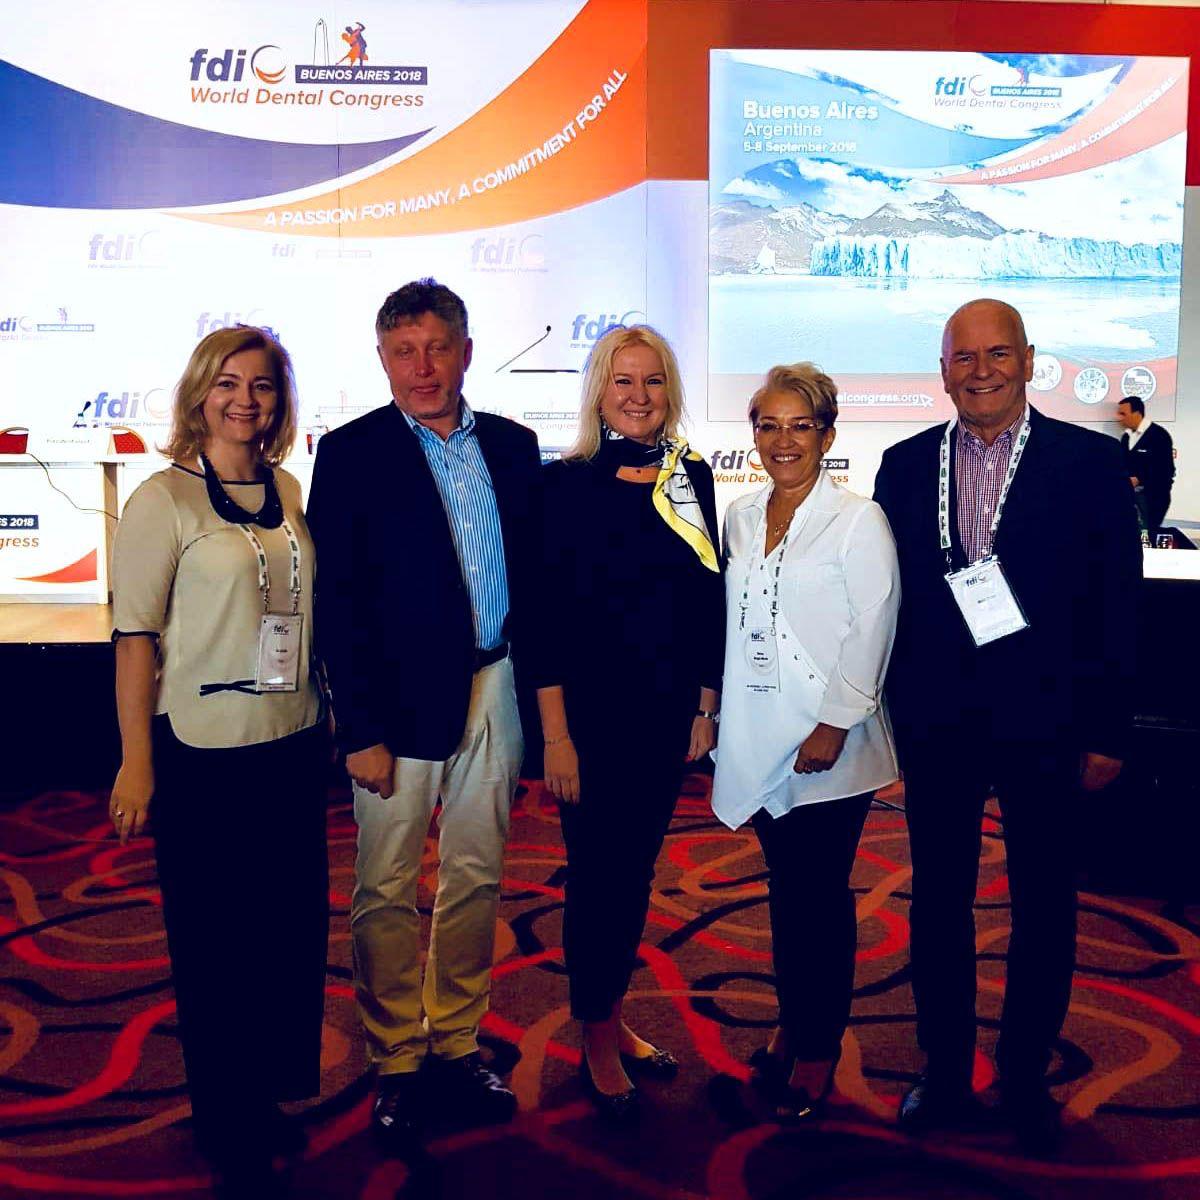 Kongres FDI: cała uwaga na Buenos Aires